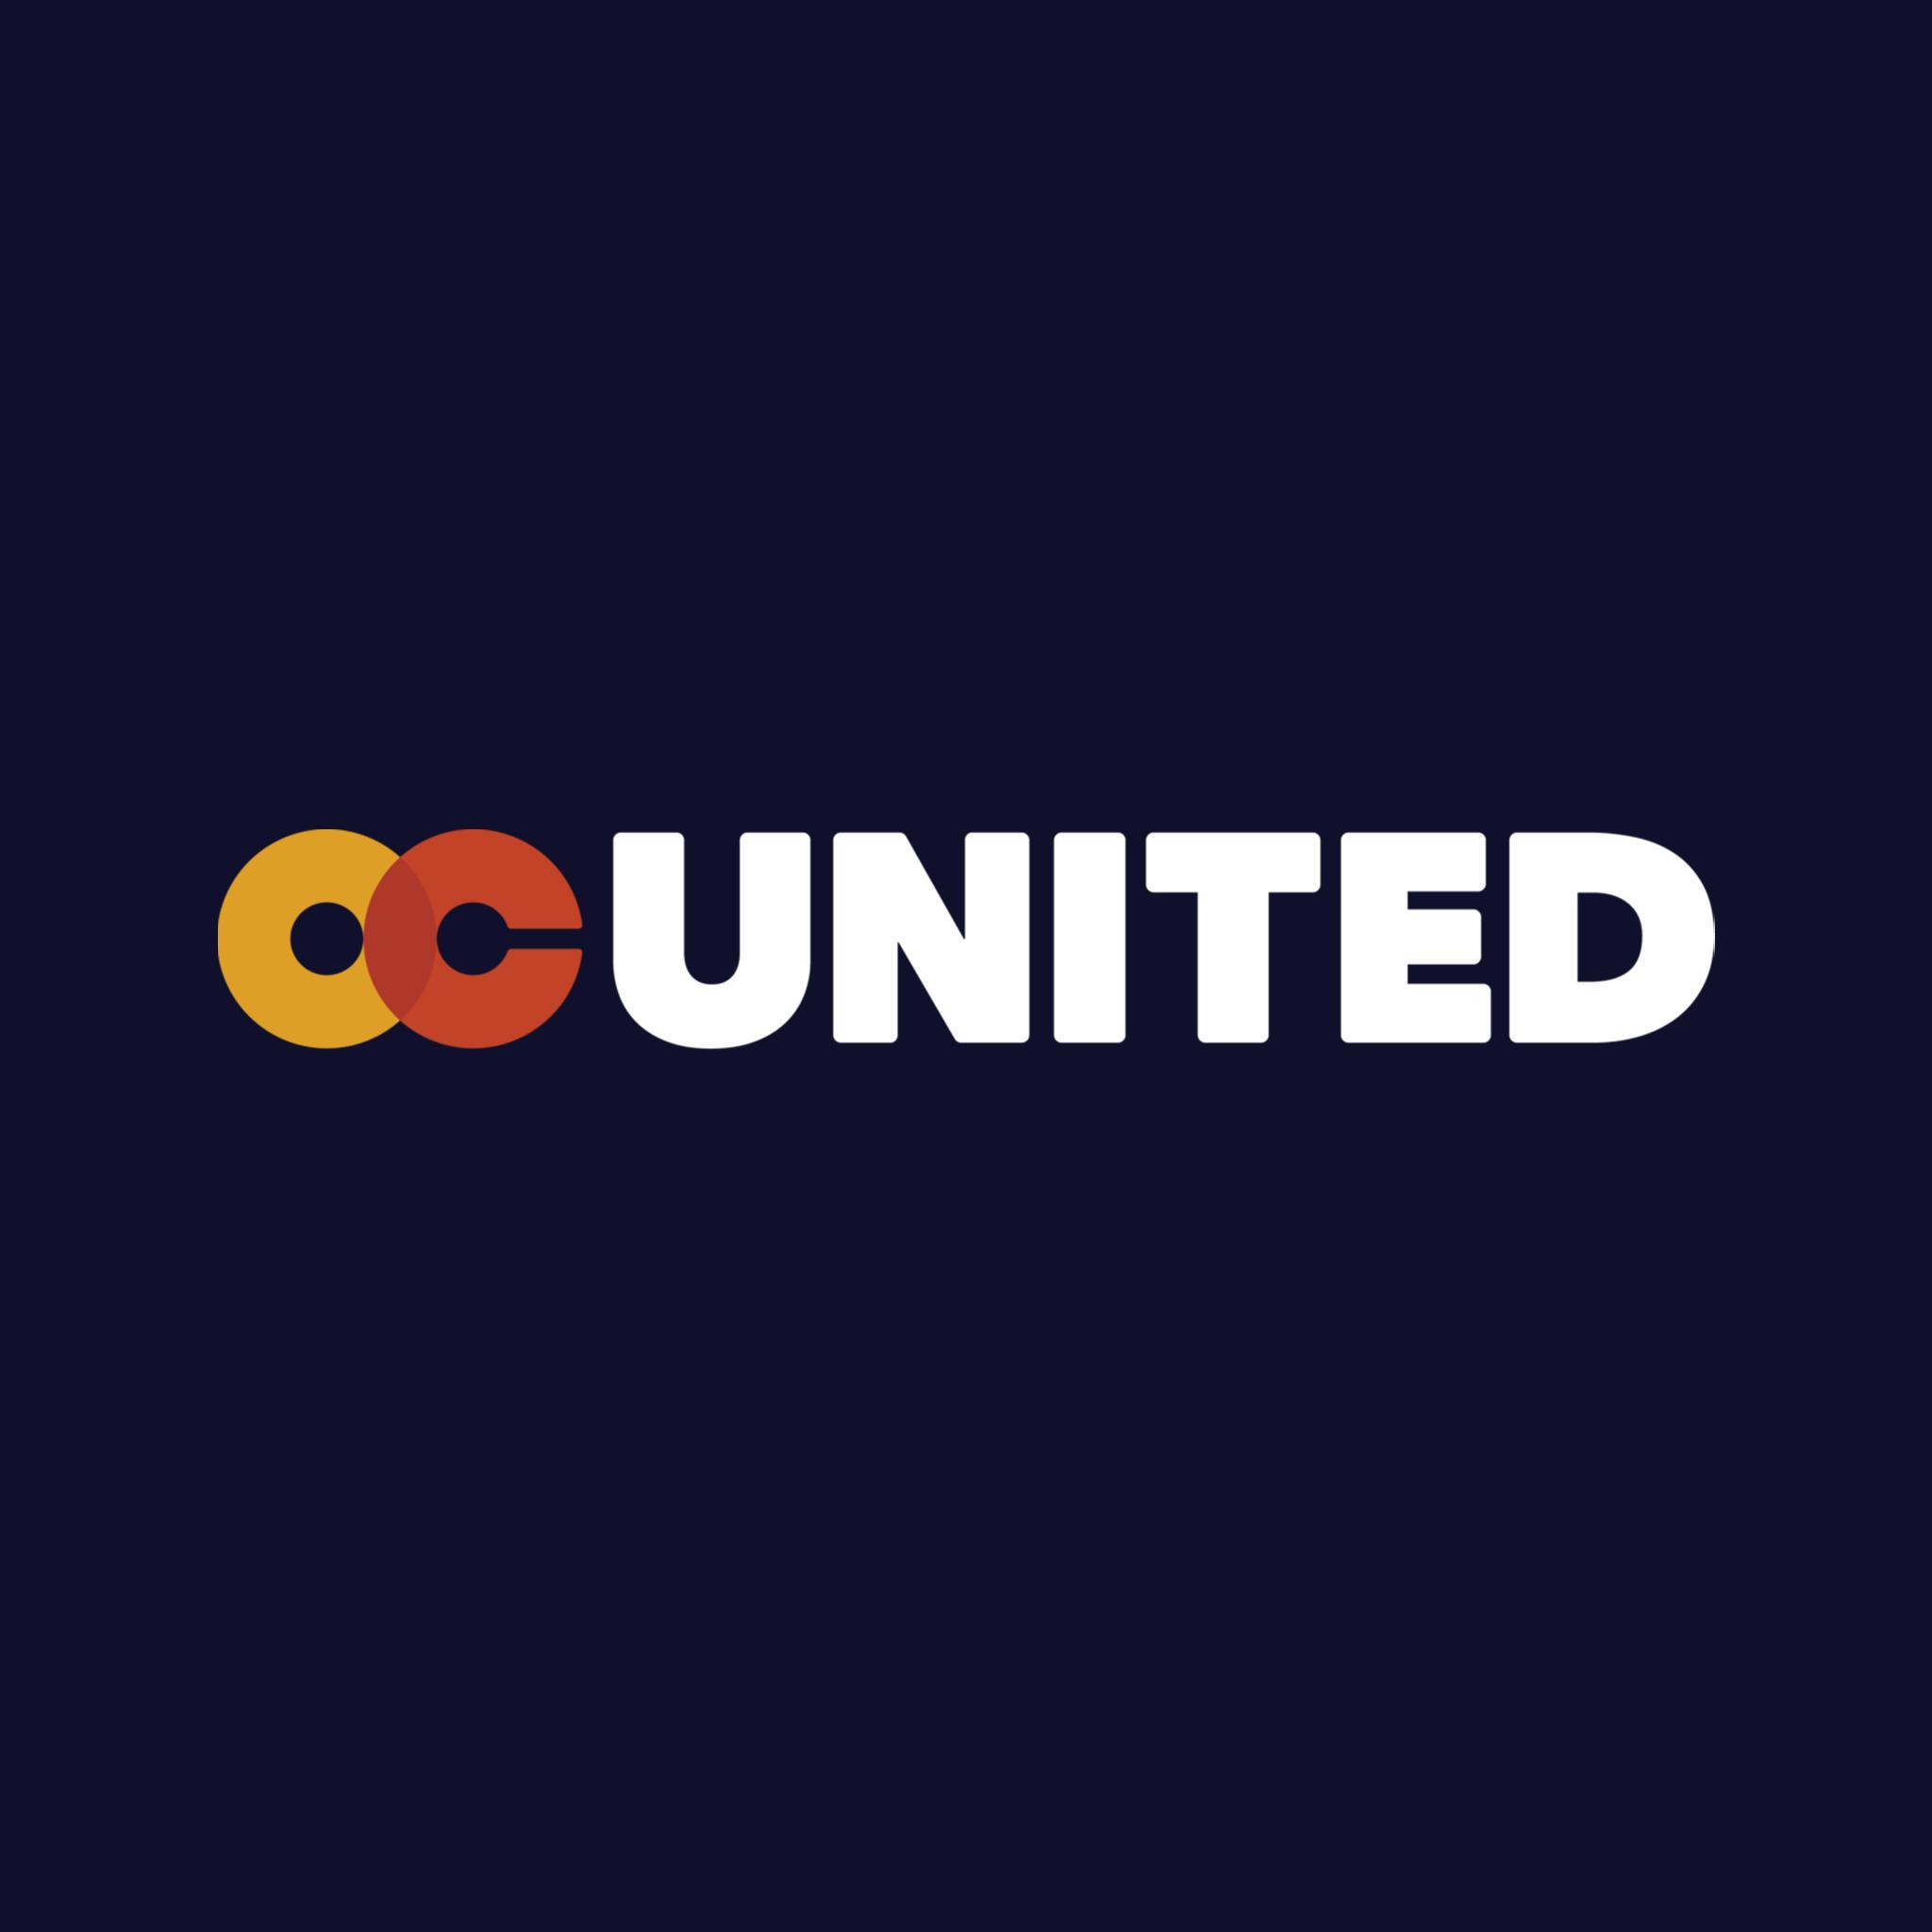 OC United